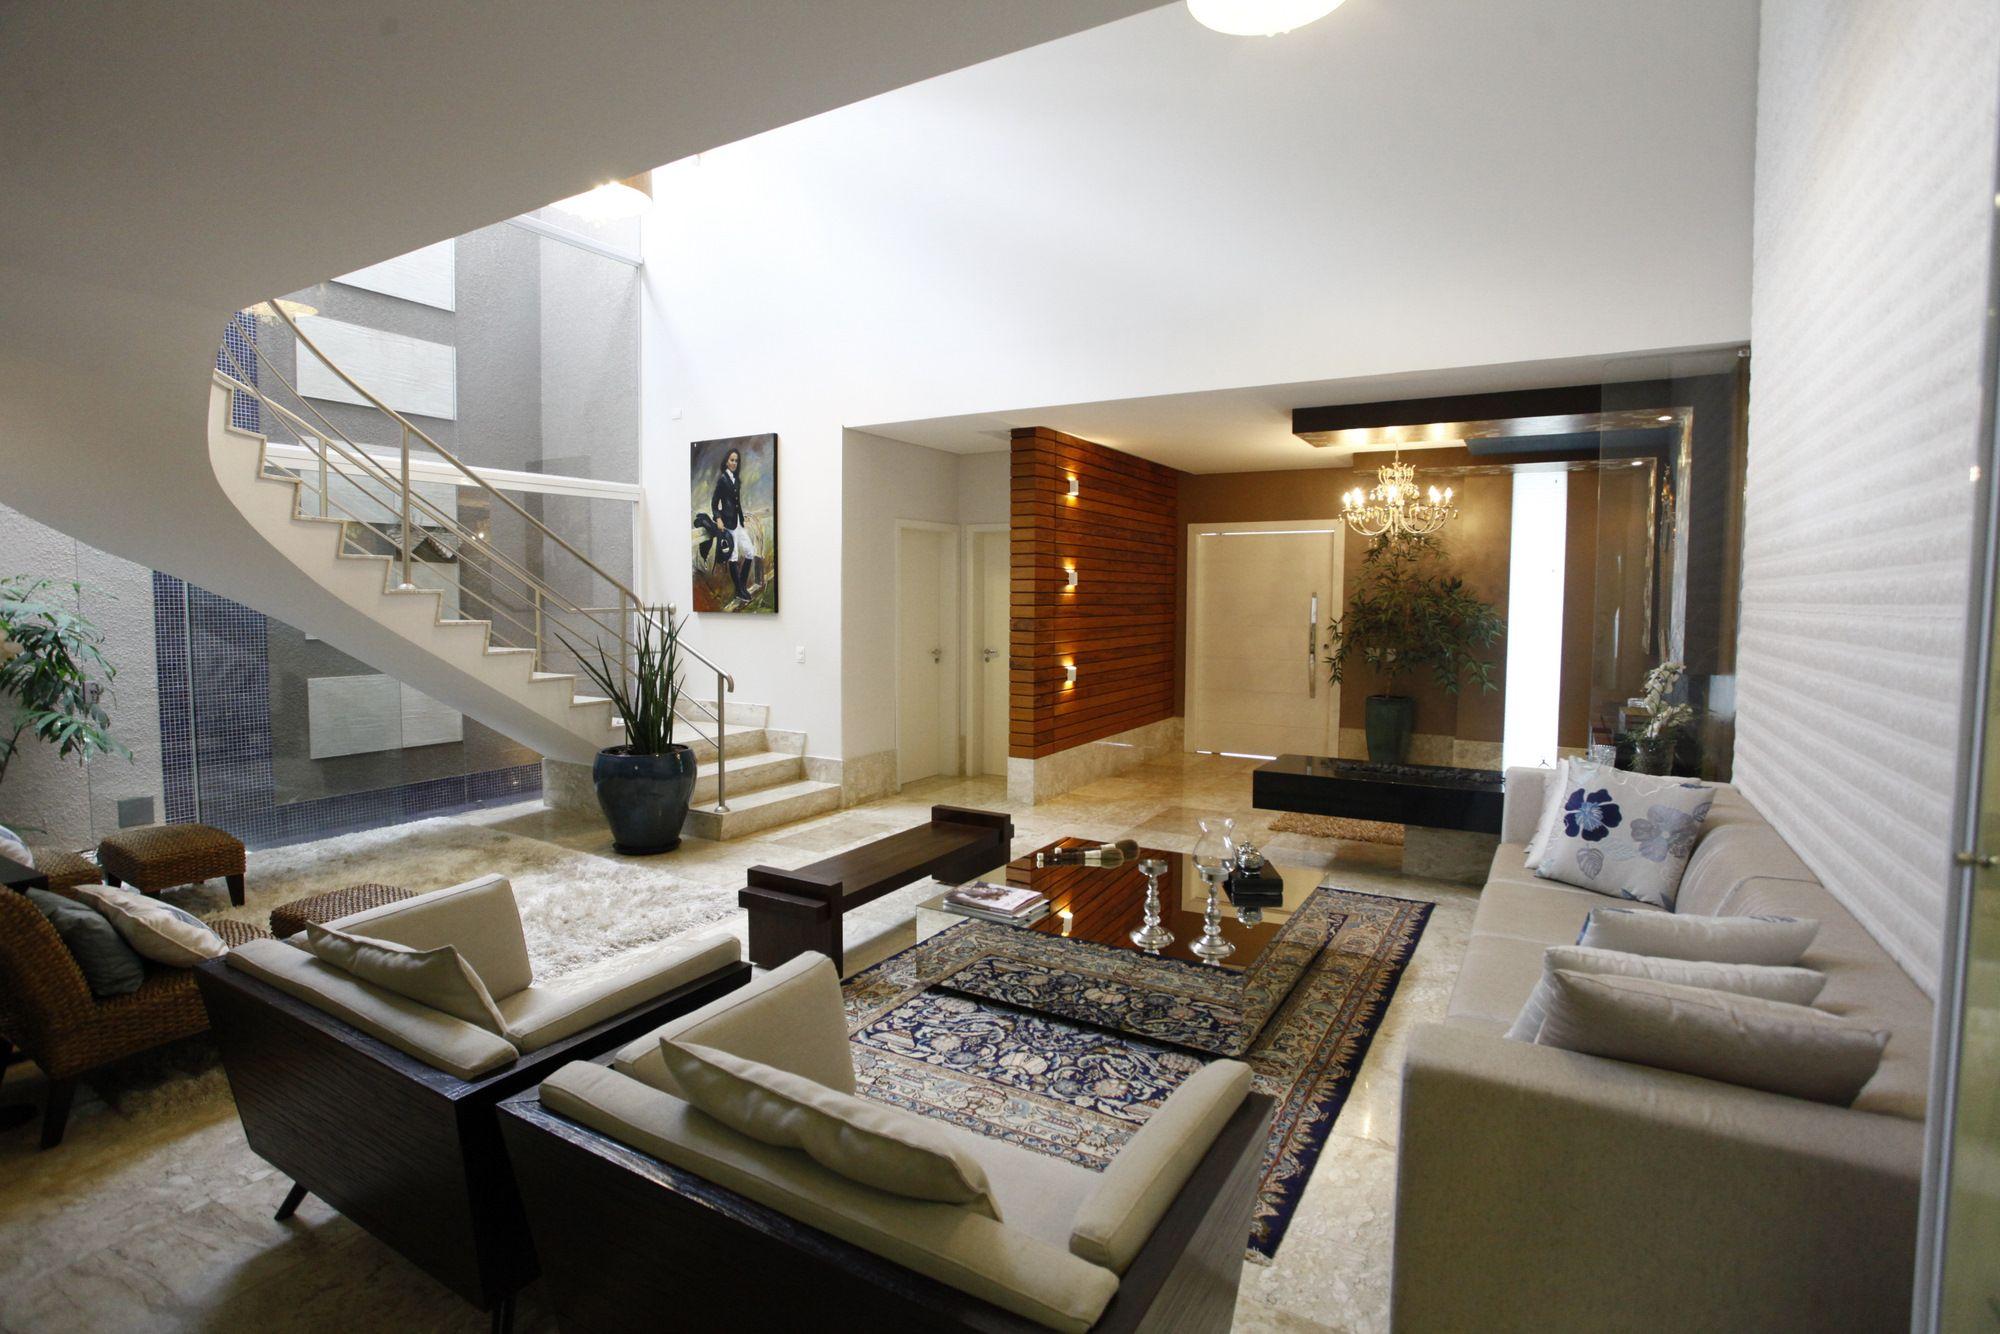 casa integrada - Pesquisa Google